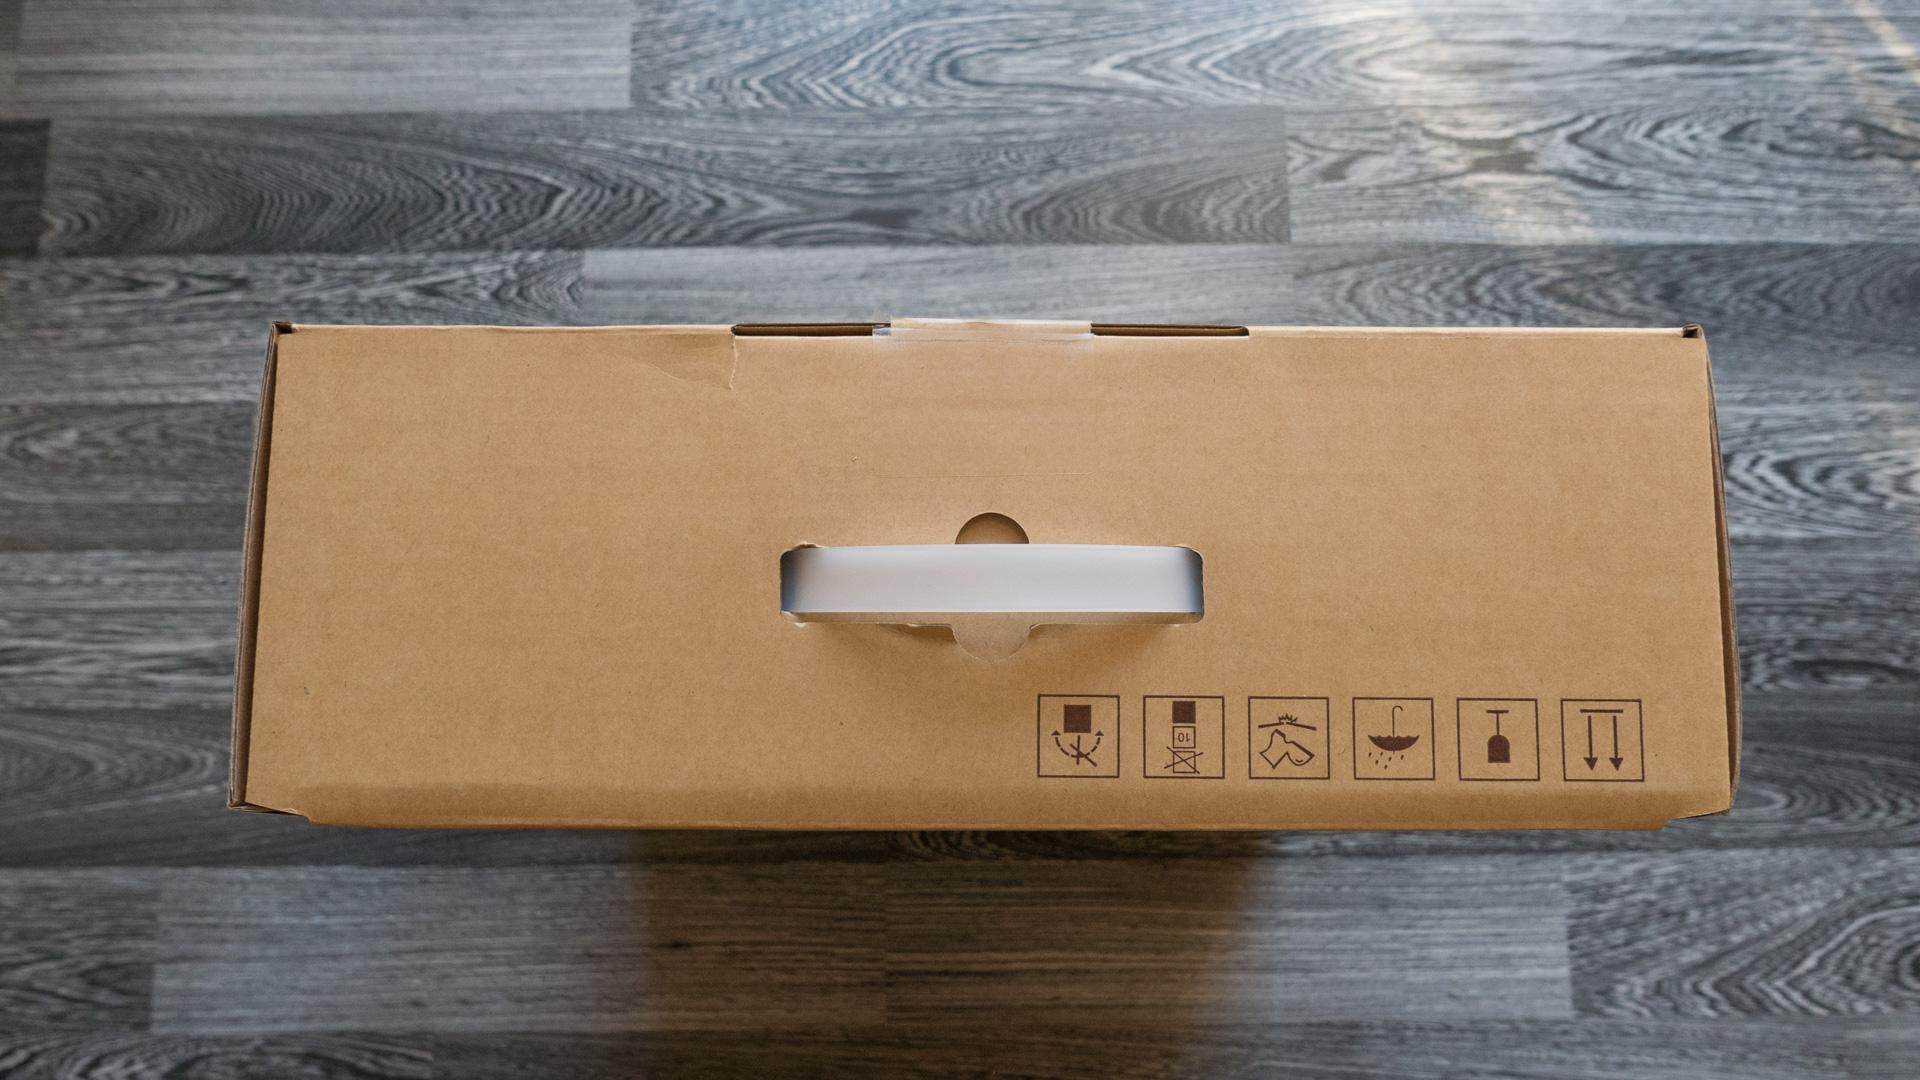 Xiaomi-roborock-S55-Unboxing-4